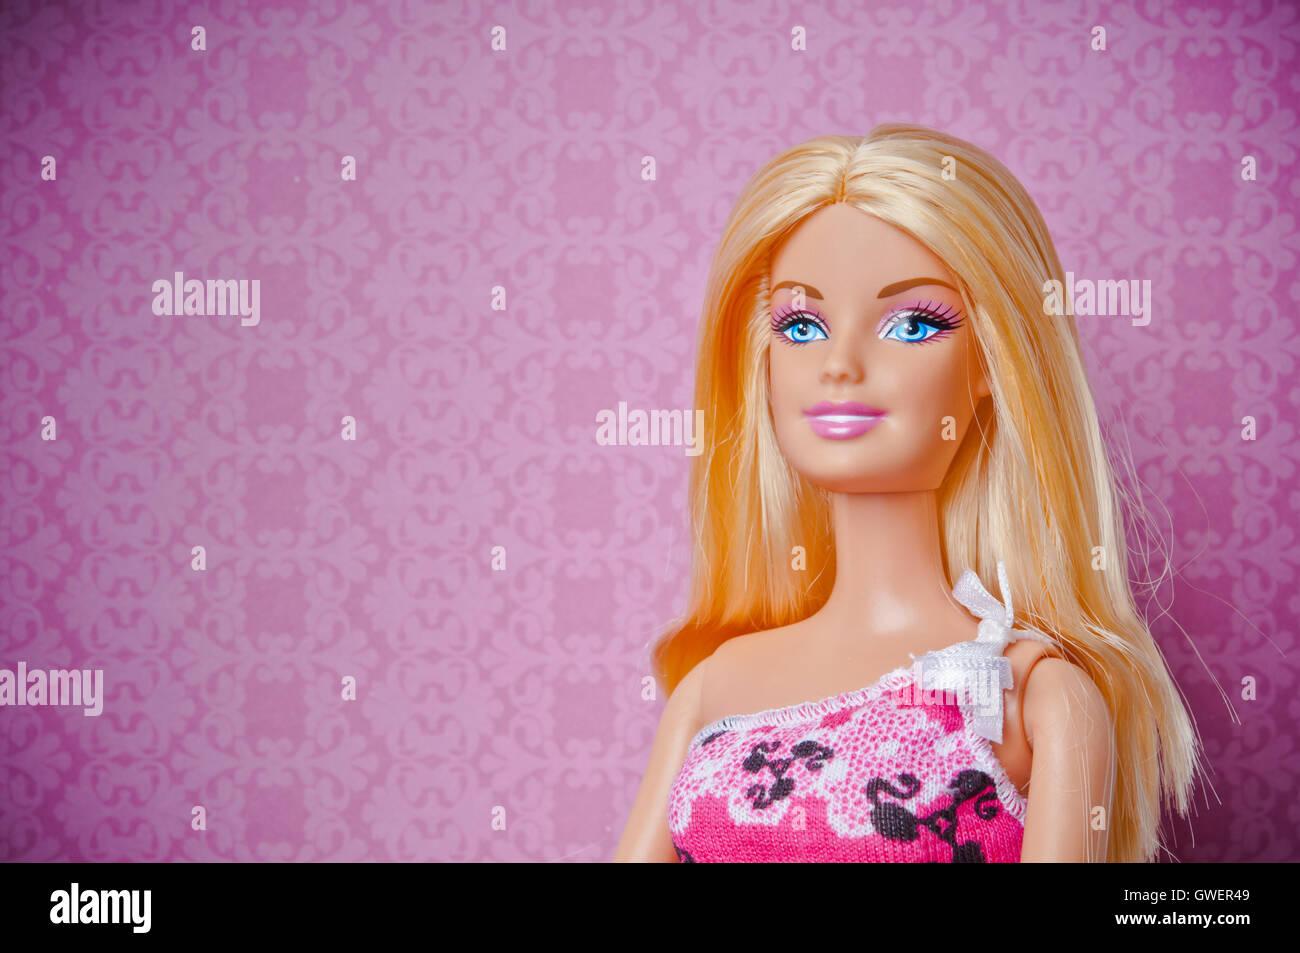 blonde Barbie doll - Stock Image